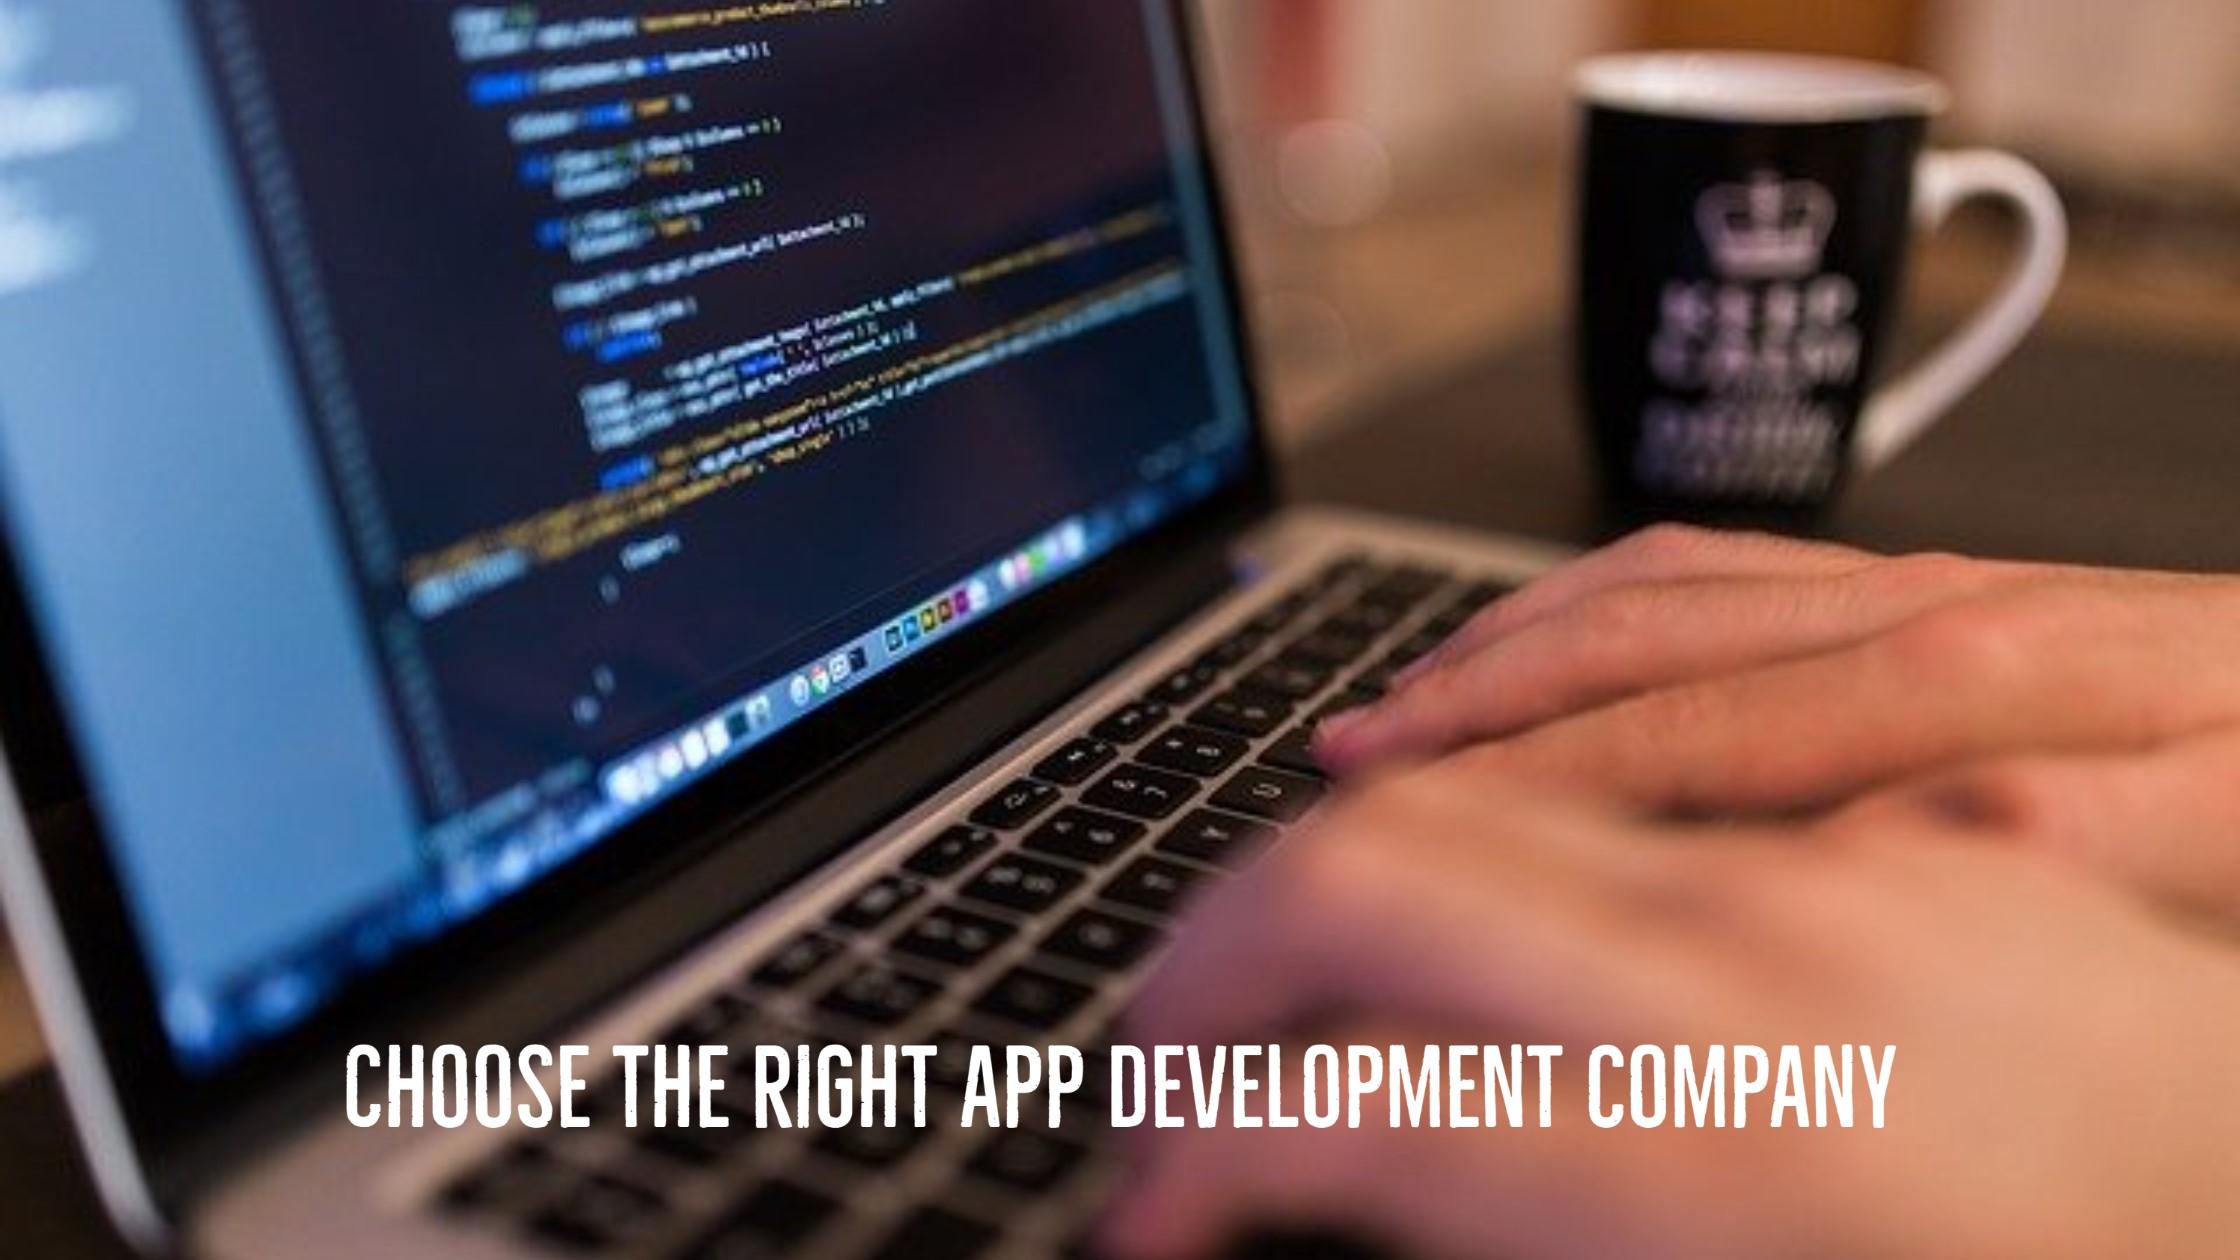 Choose the right app development company